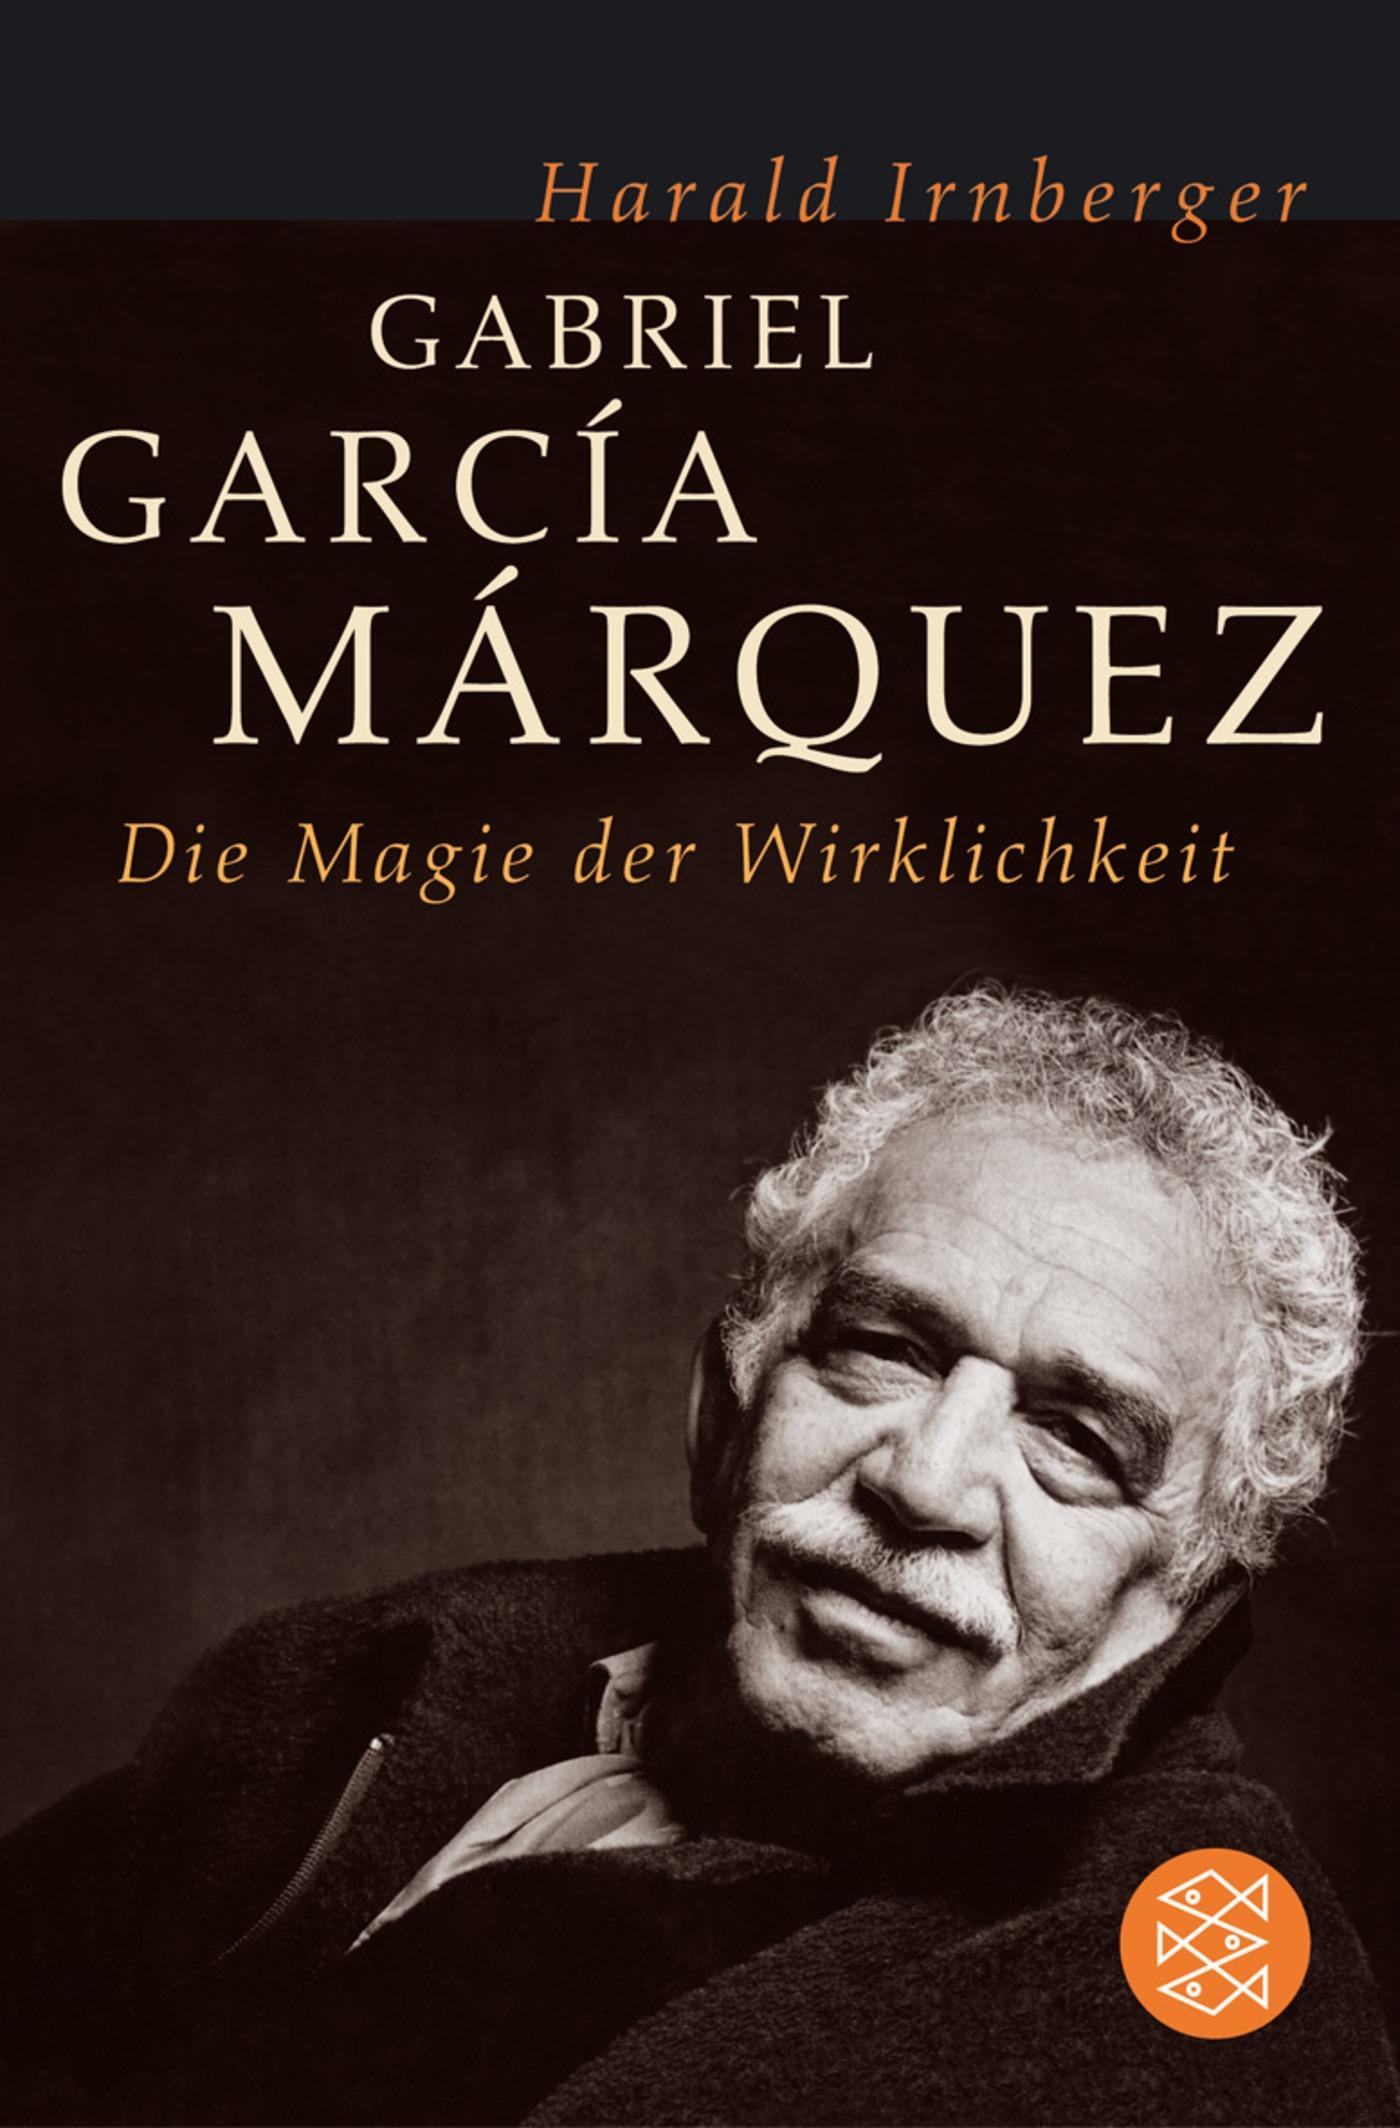 Gabriel Garcia Márquez Harald Irnberger